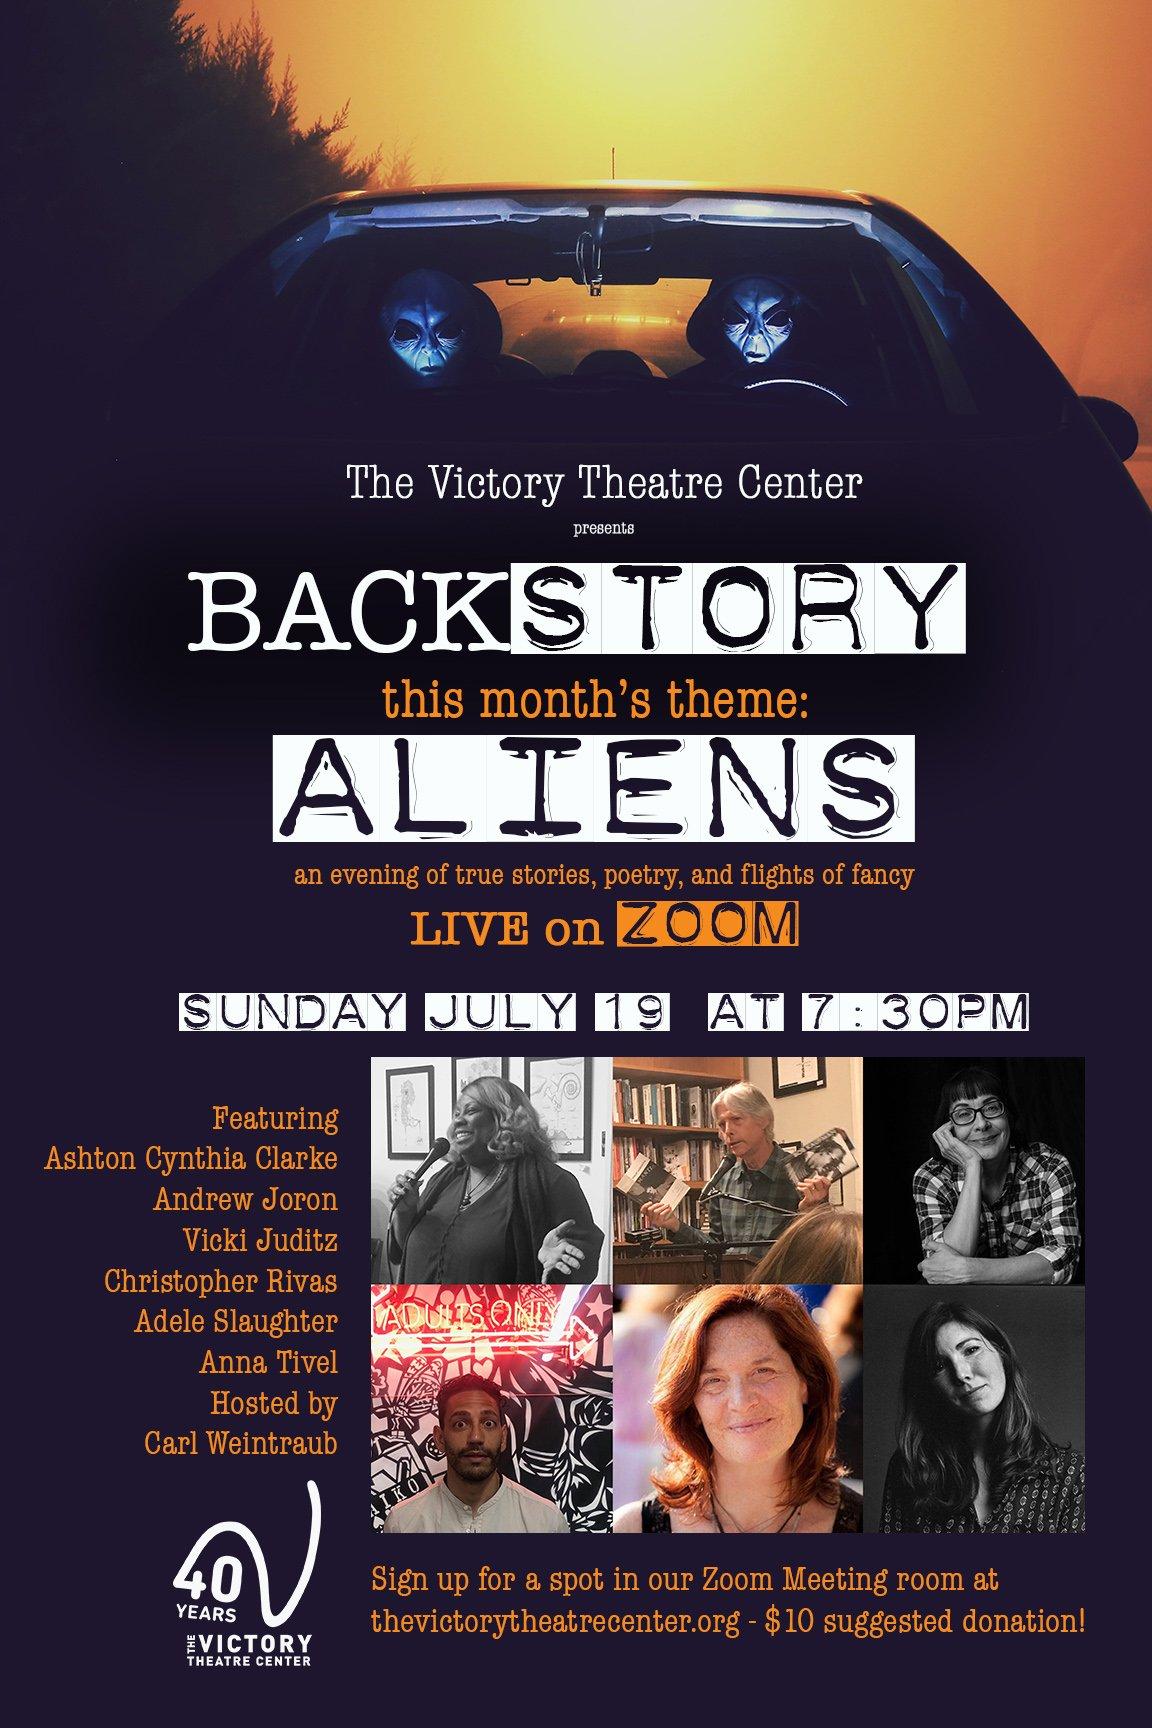 Backstory - Aliens